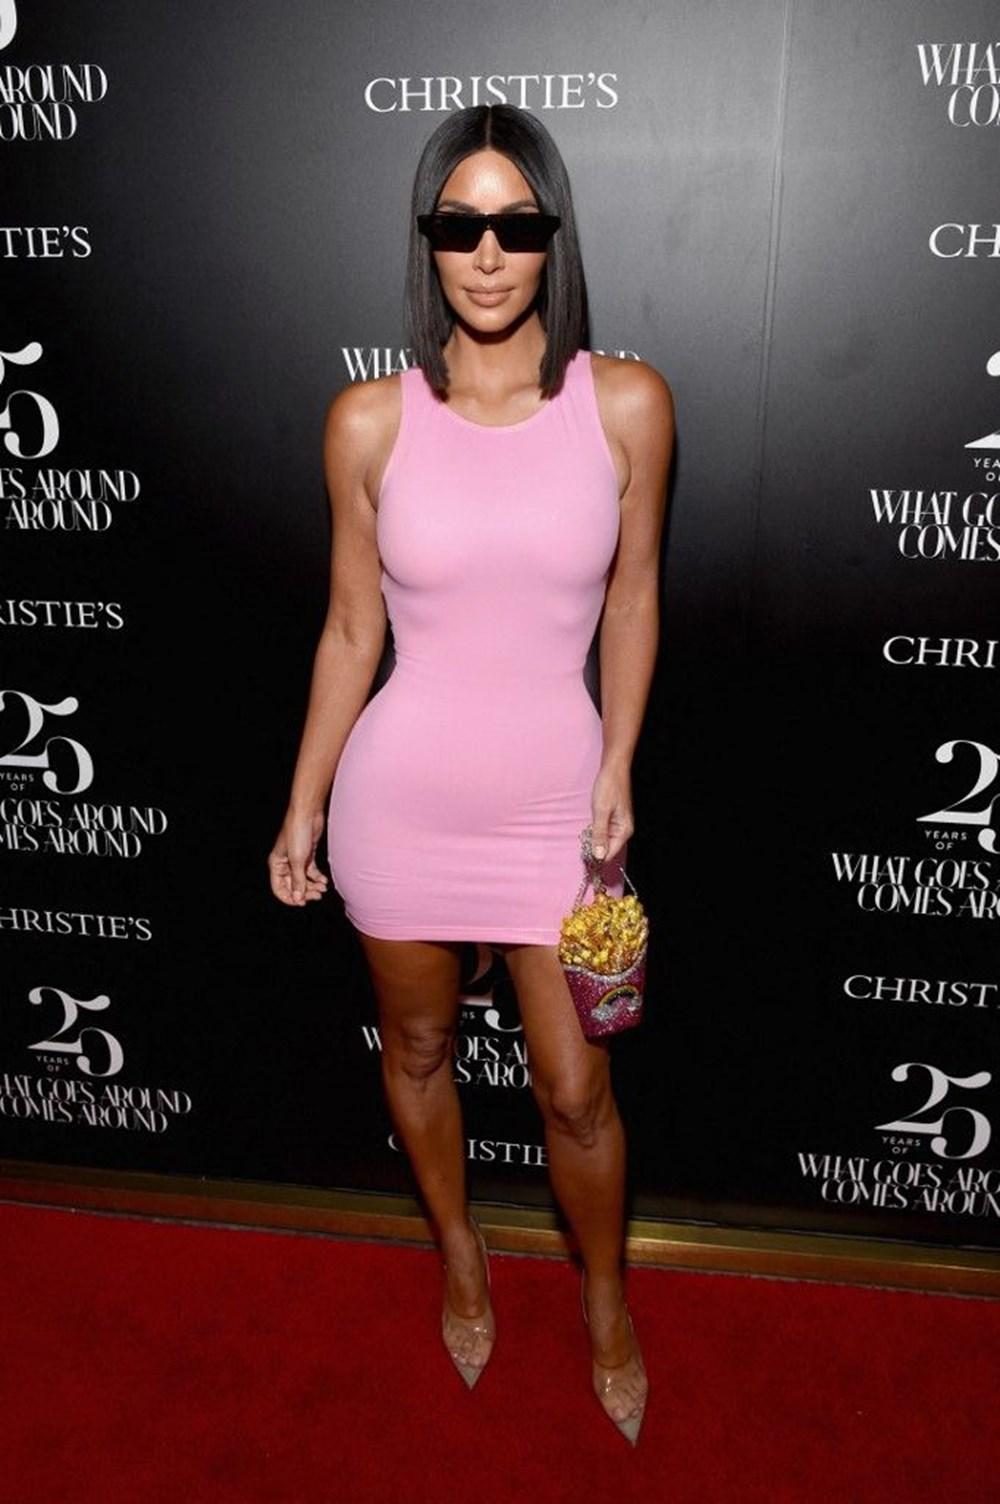 Kim Kardashian'a elmas yüzük ve doğum kontrol hapıyla taciz - 6